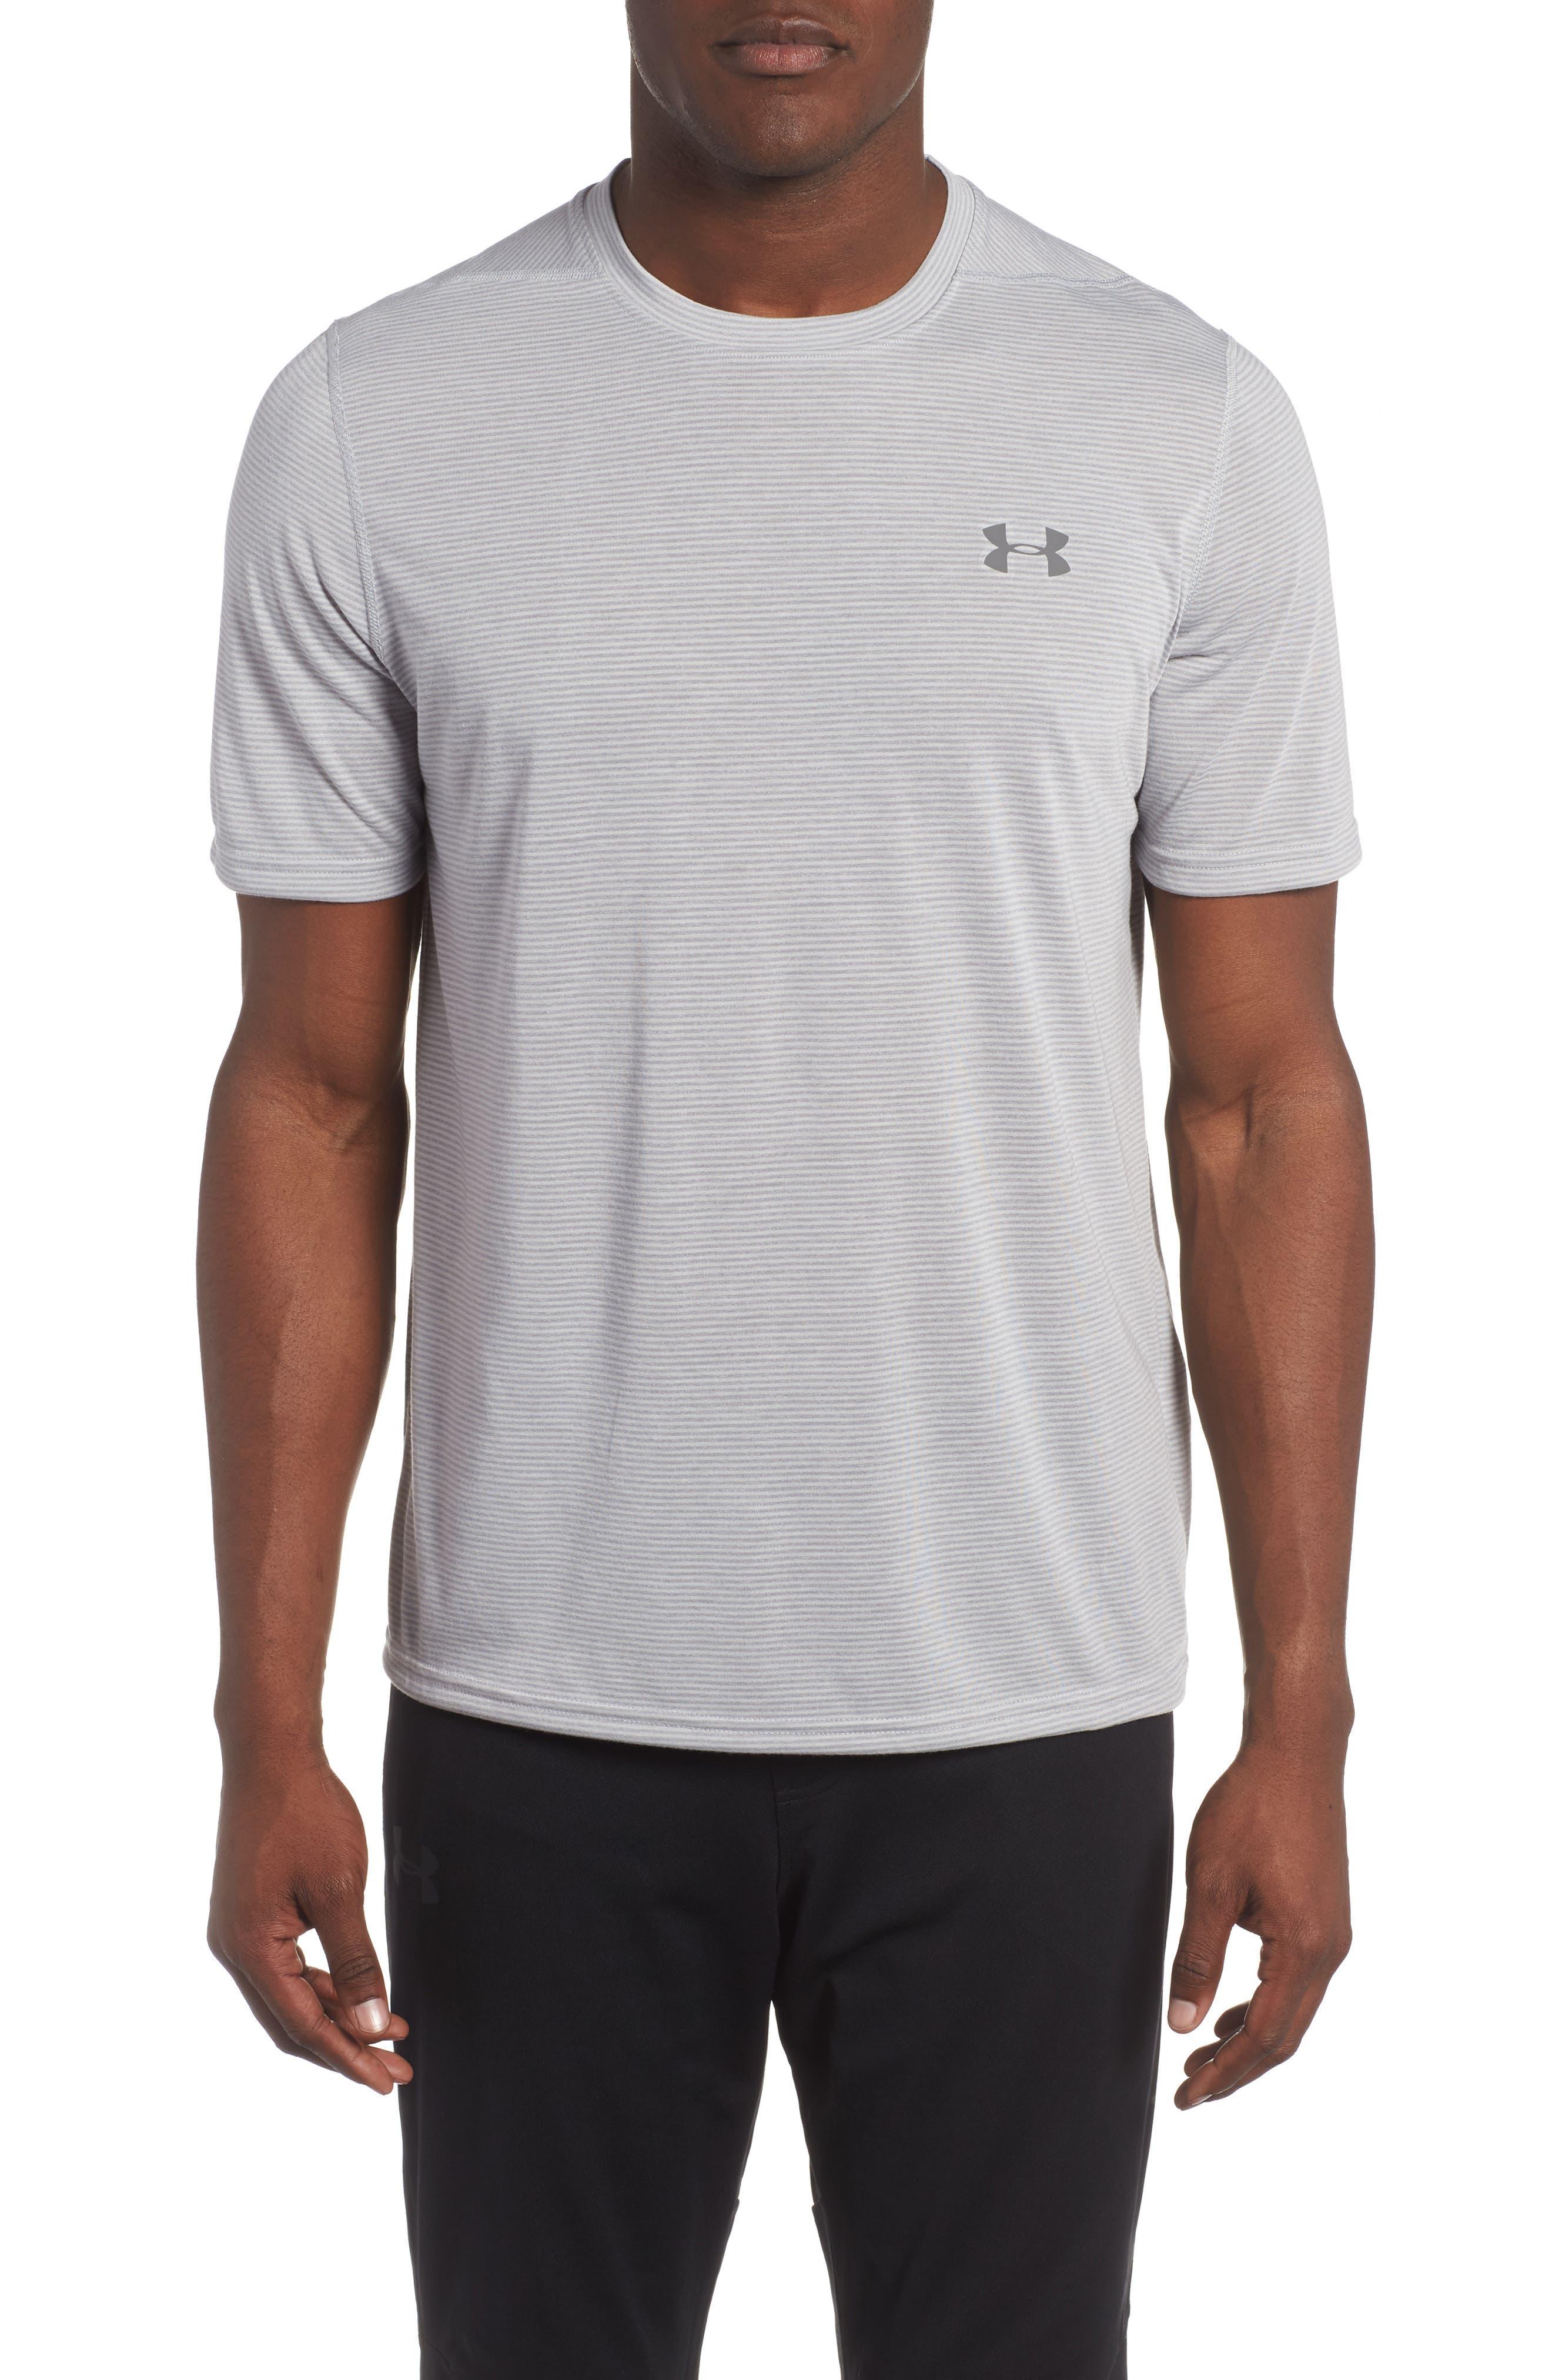 Main Image - Under Armour Threadborne Siro Regular Fit T-Shirt